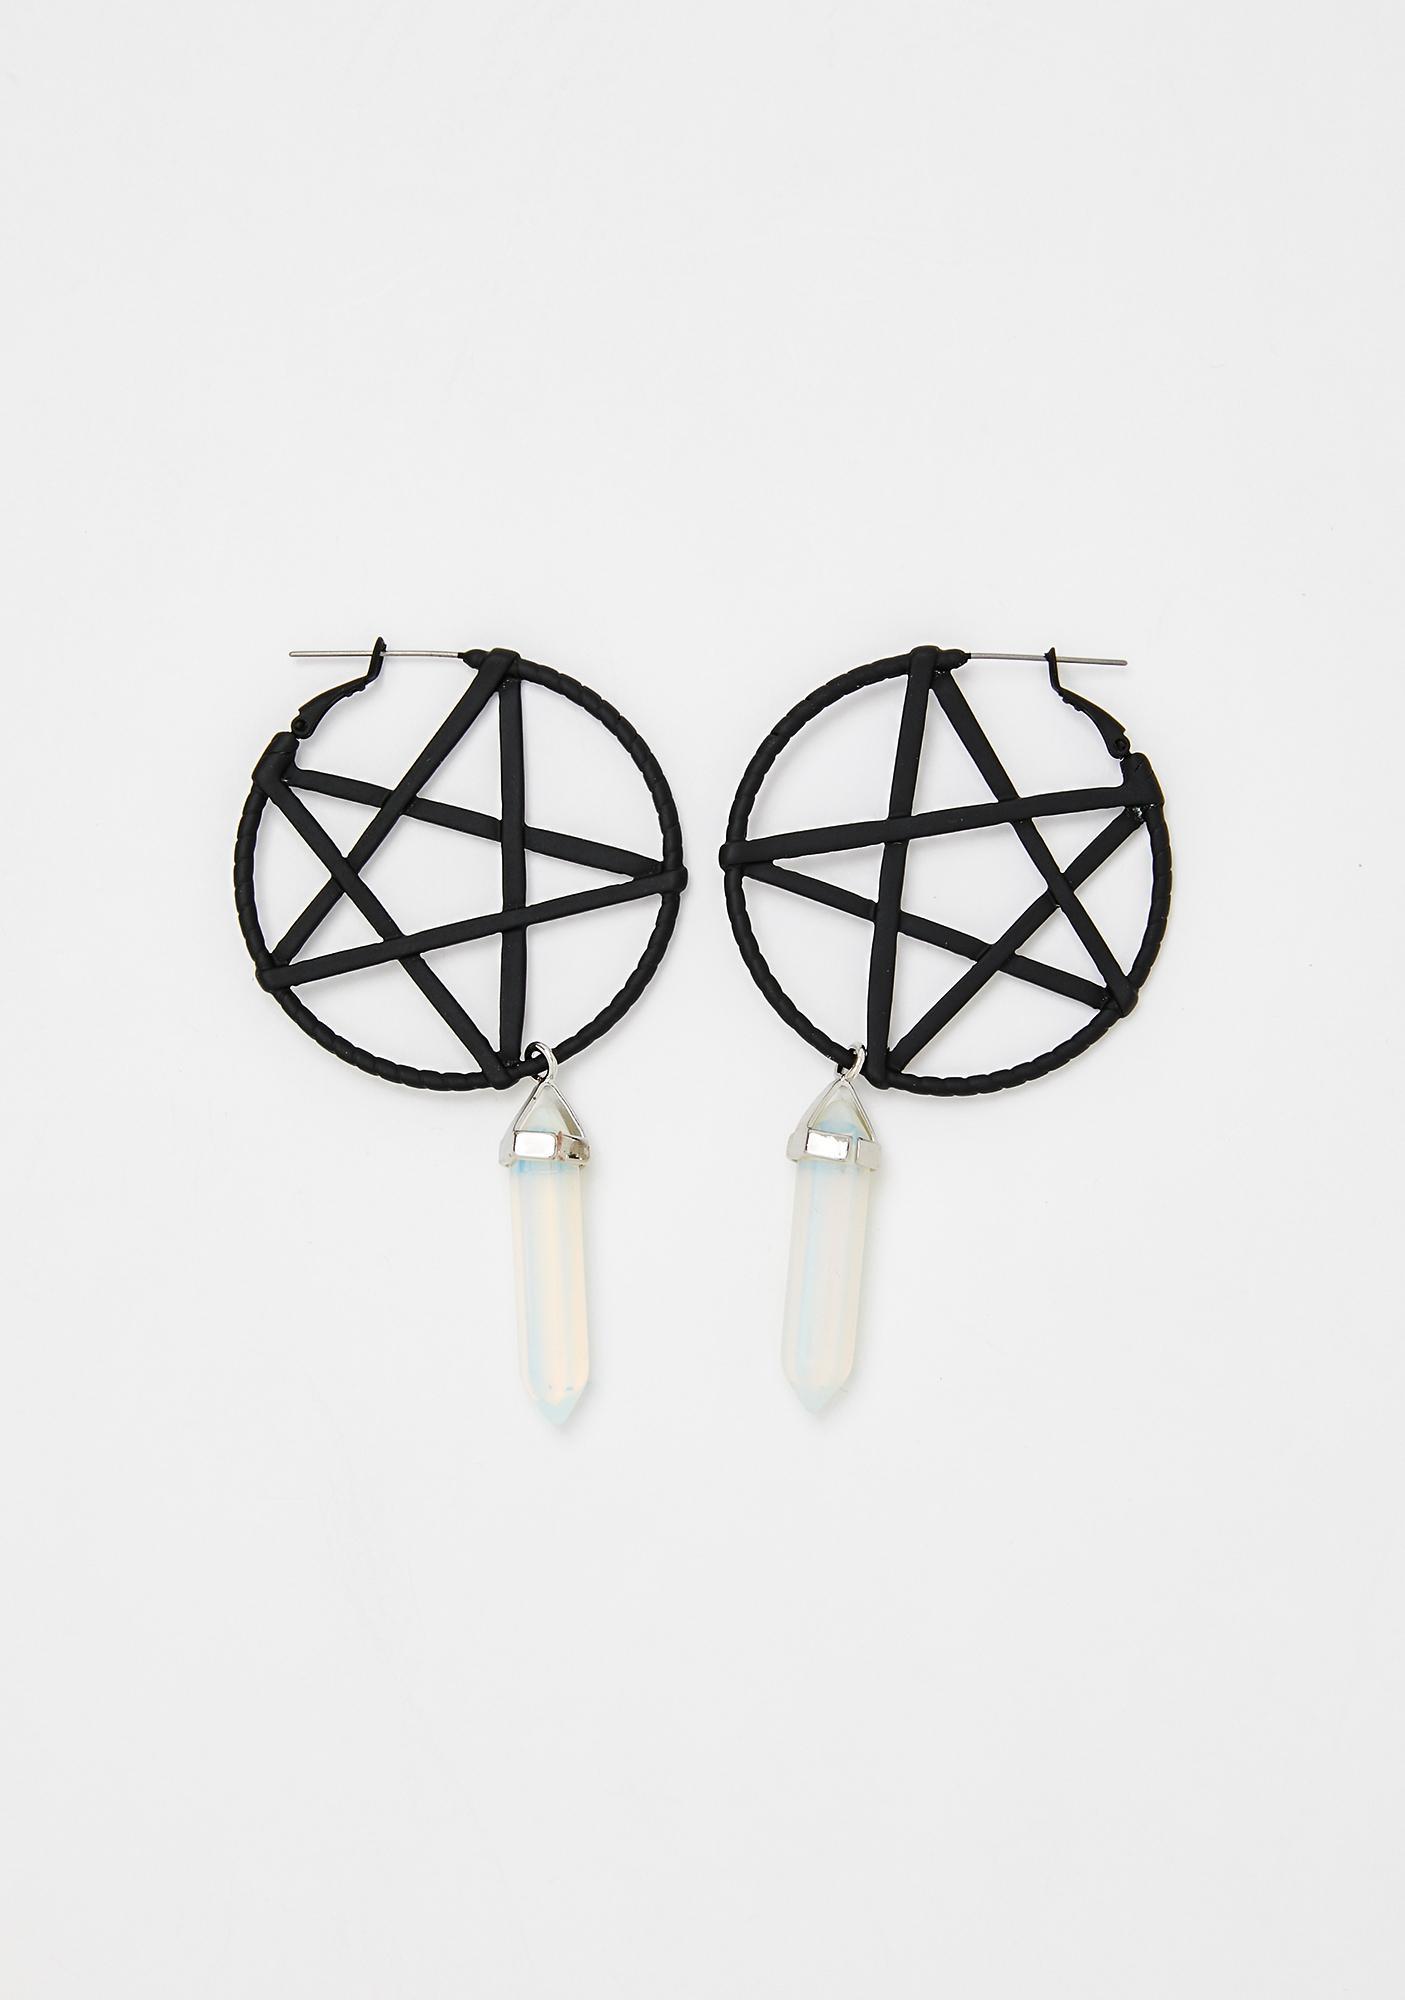 Naturally Charmed Crystal Earrings